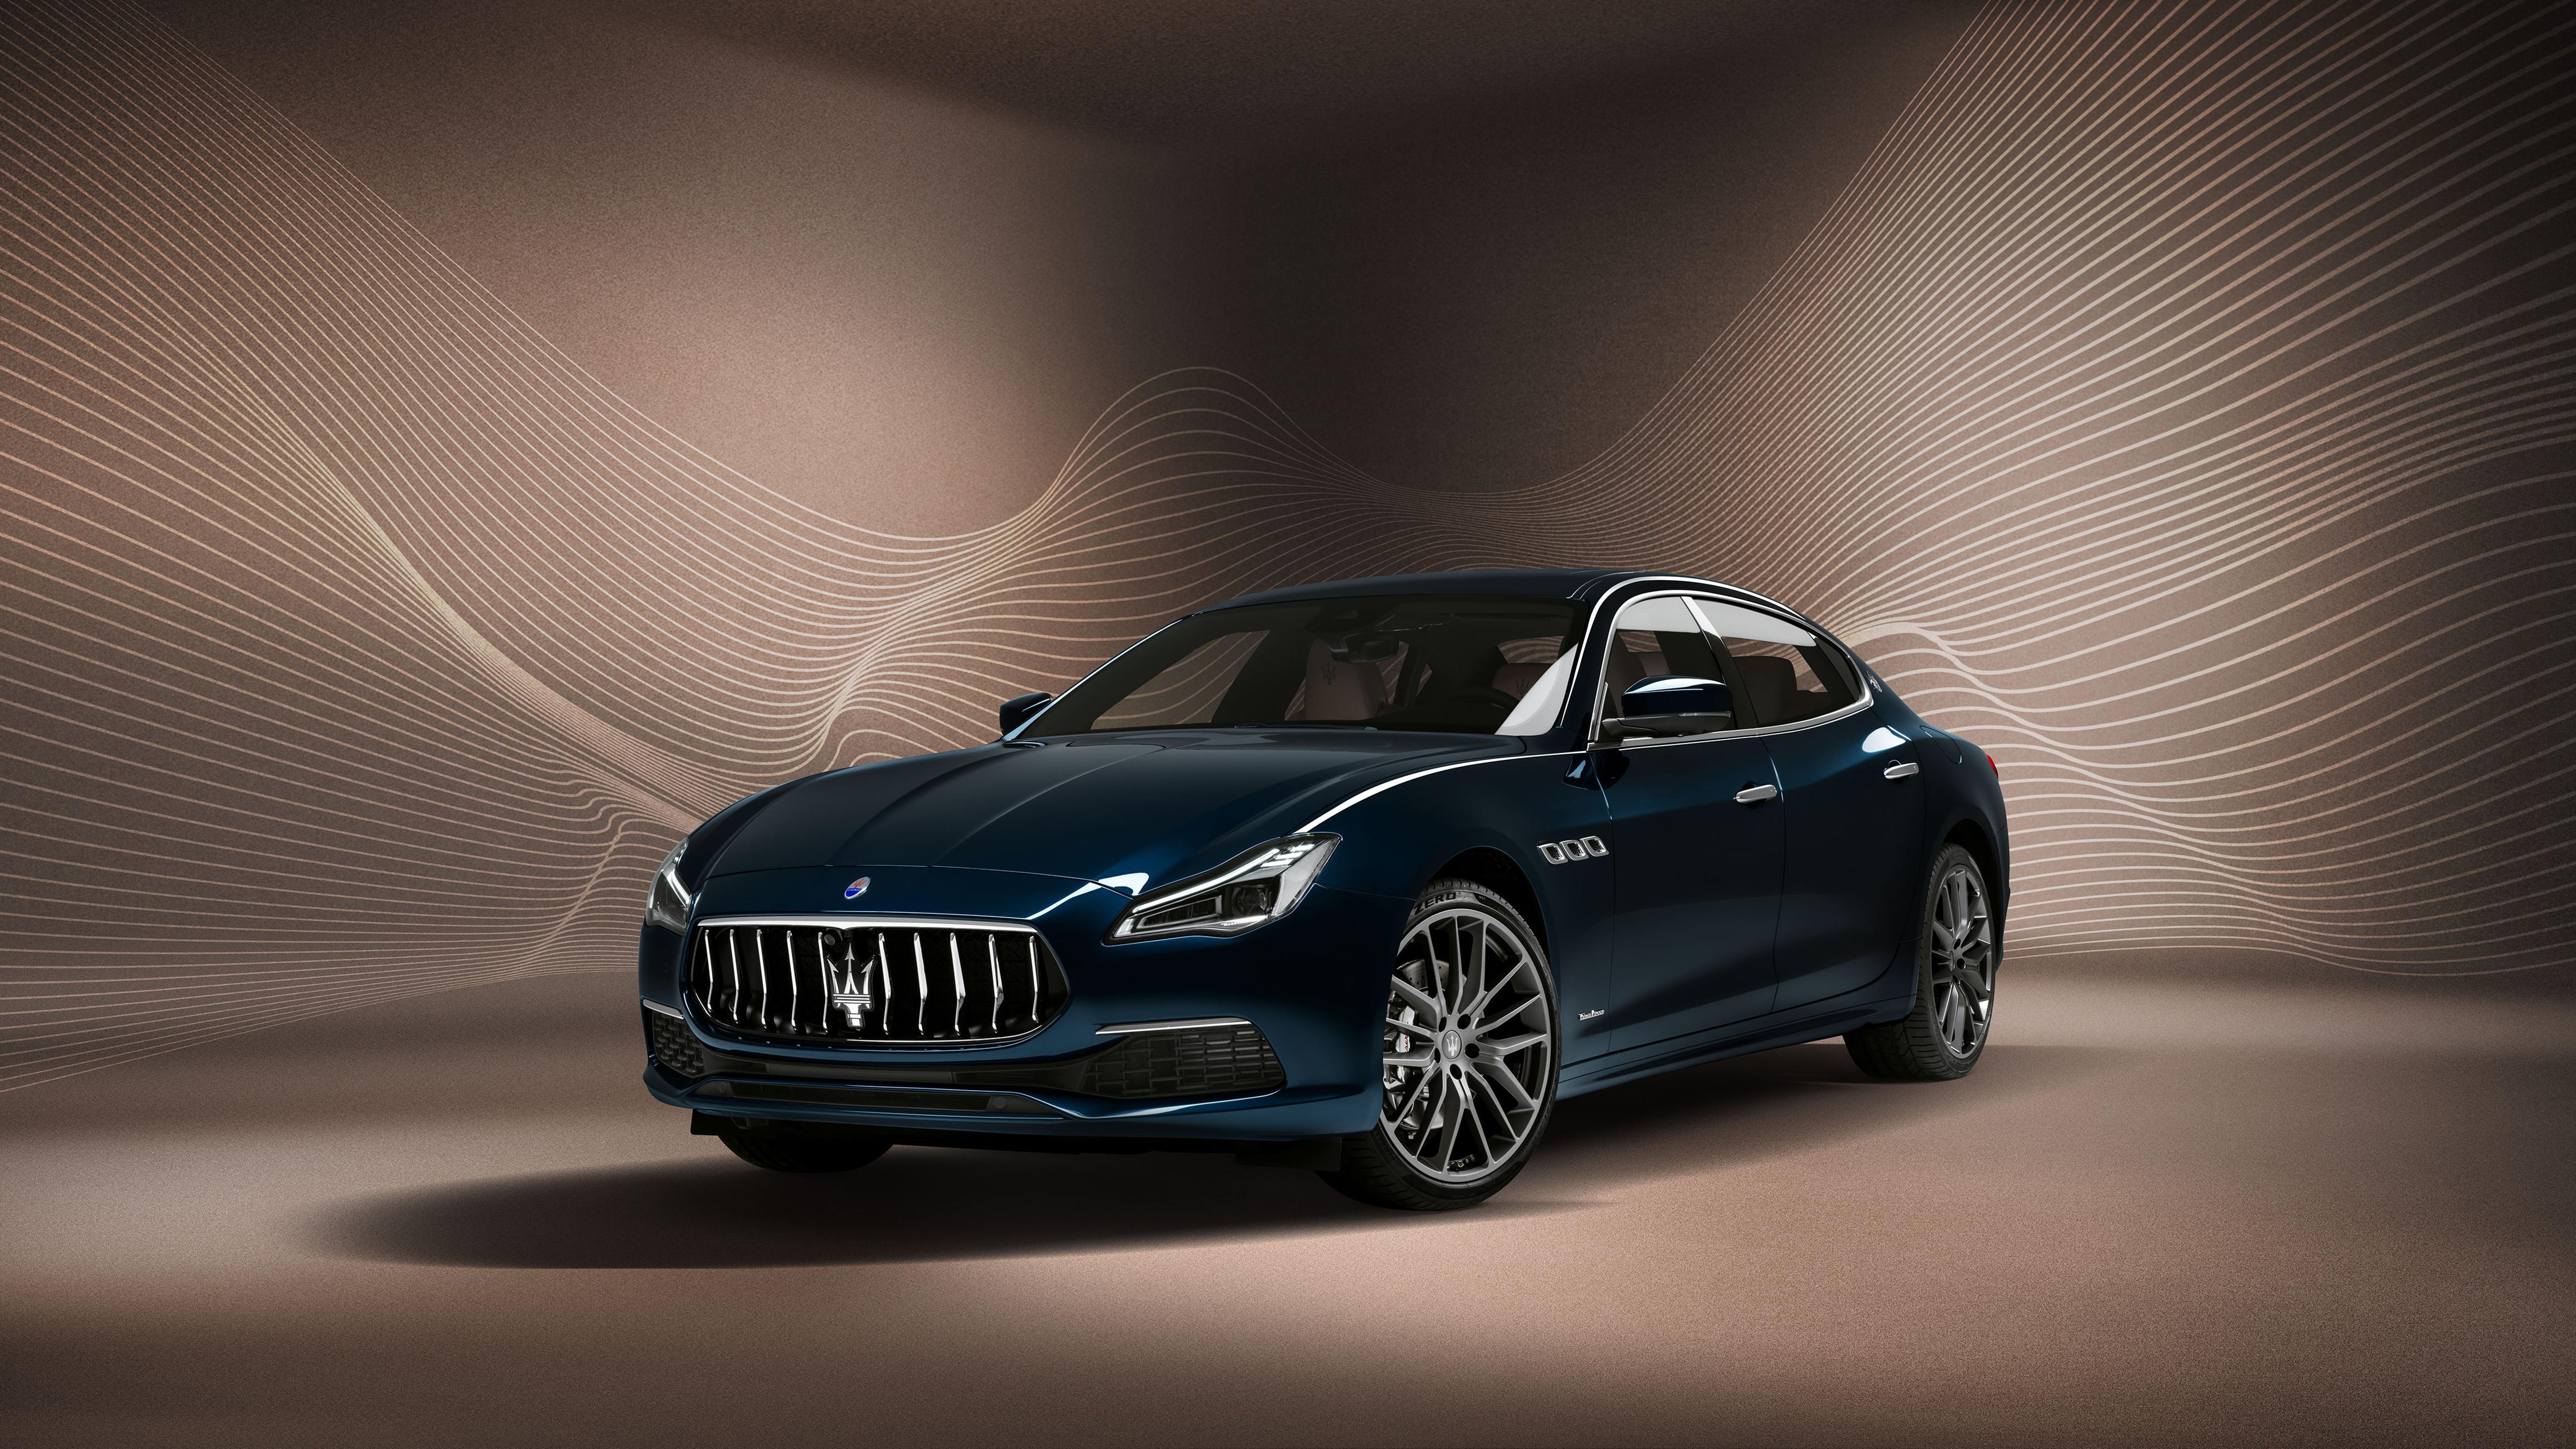 Maserati Quattroporte GranLusso Royale 2020 5K HD desktop 5120x2880